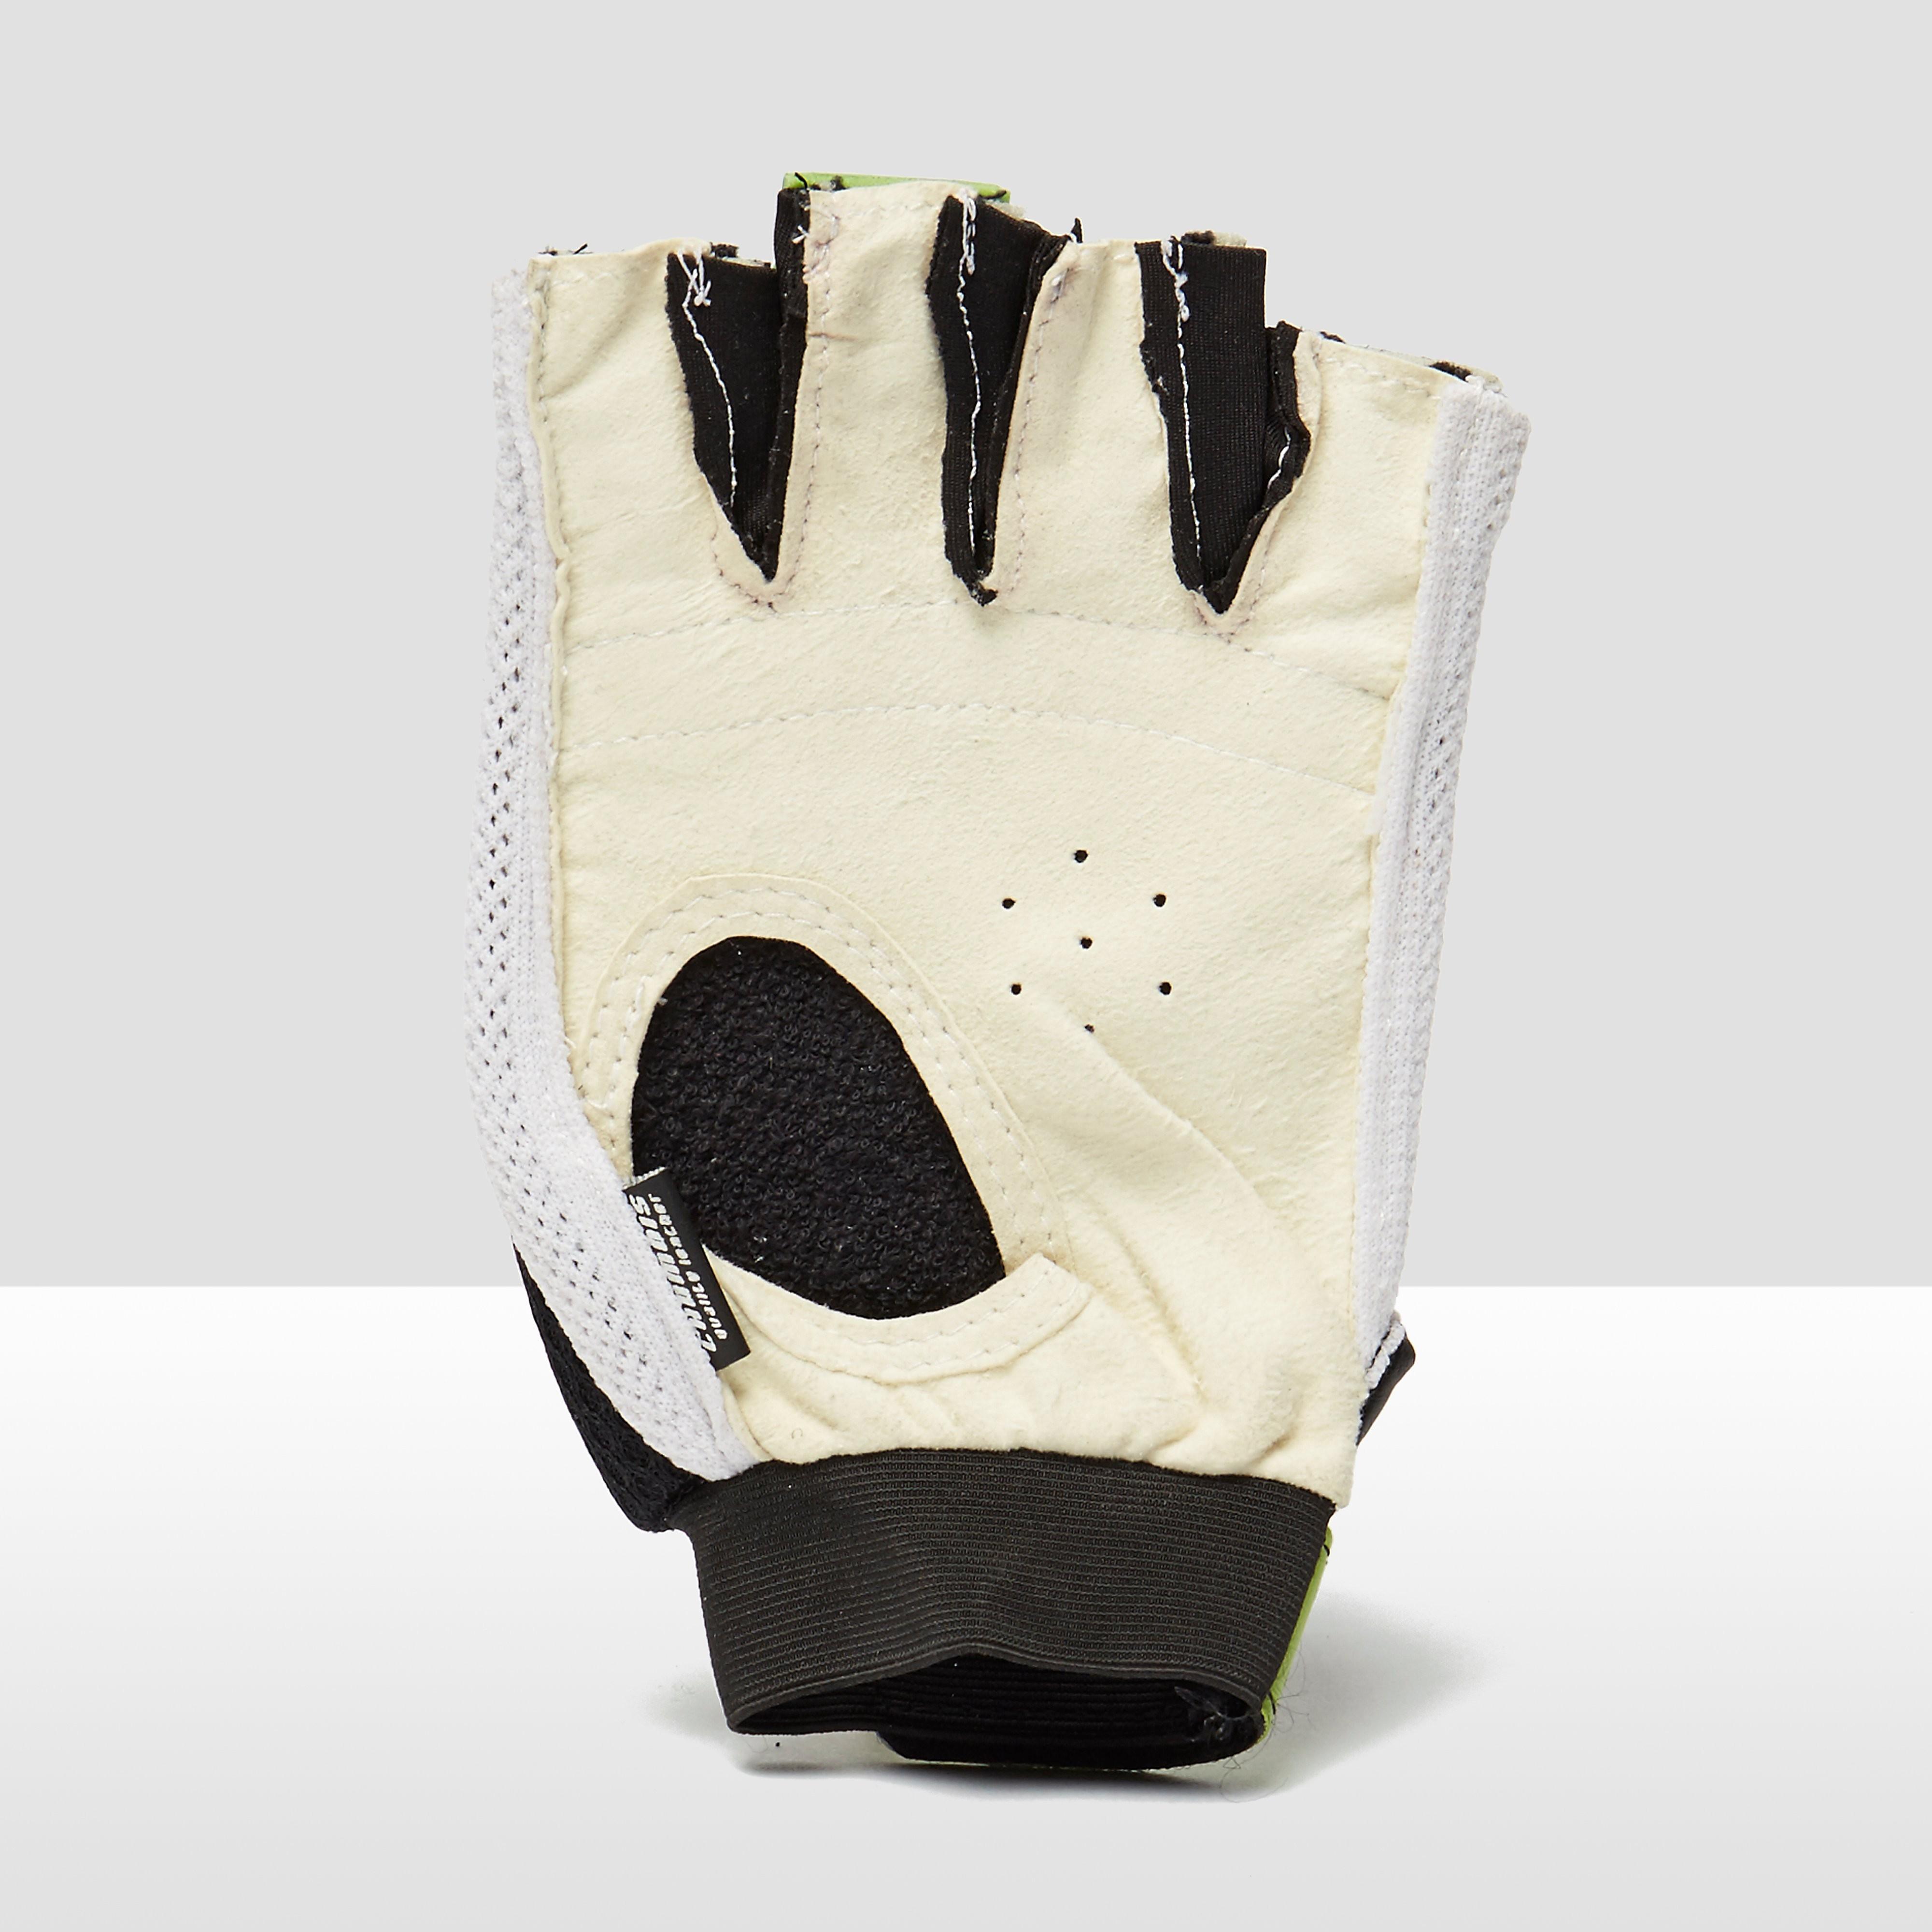 Kookaburra Venom Left Hand Glove